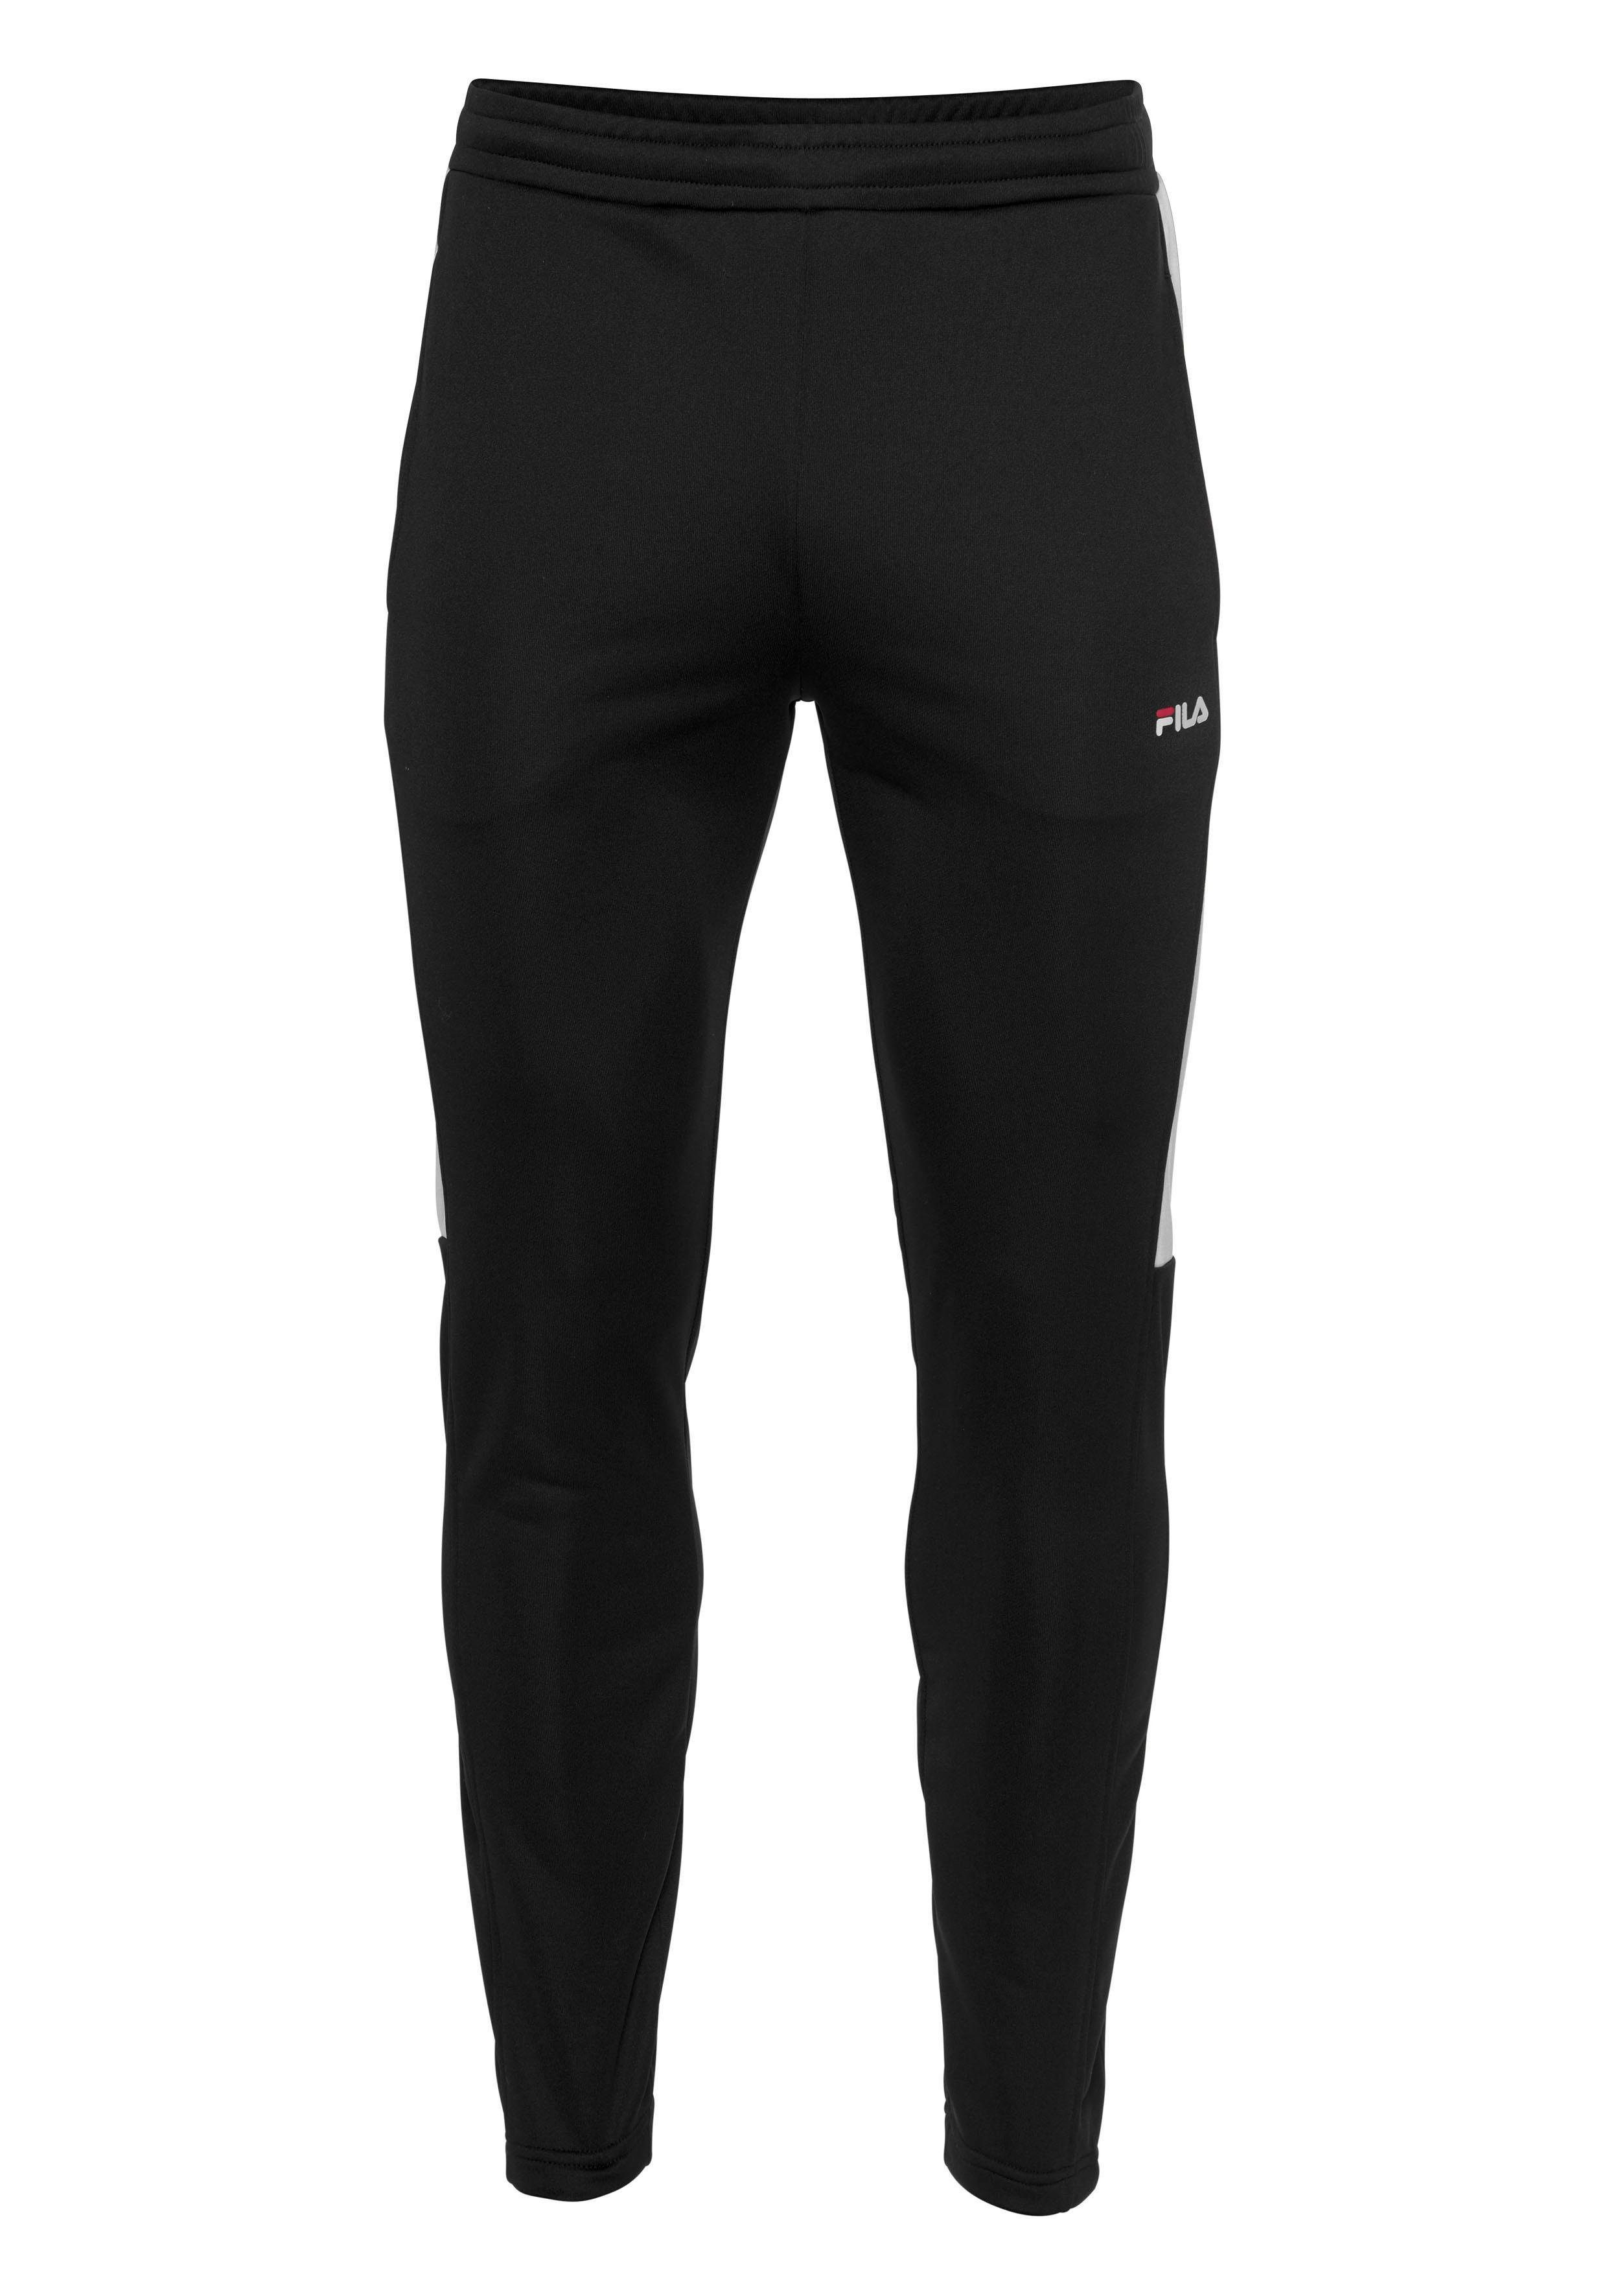 Fila Trainingshose SOLAR TIGHT PANTS, Logodruck online kaufen zvmY00